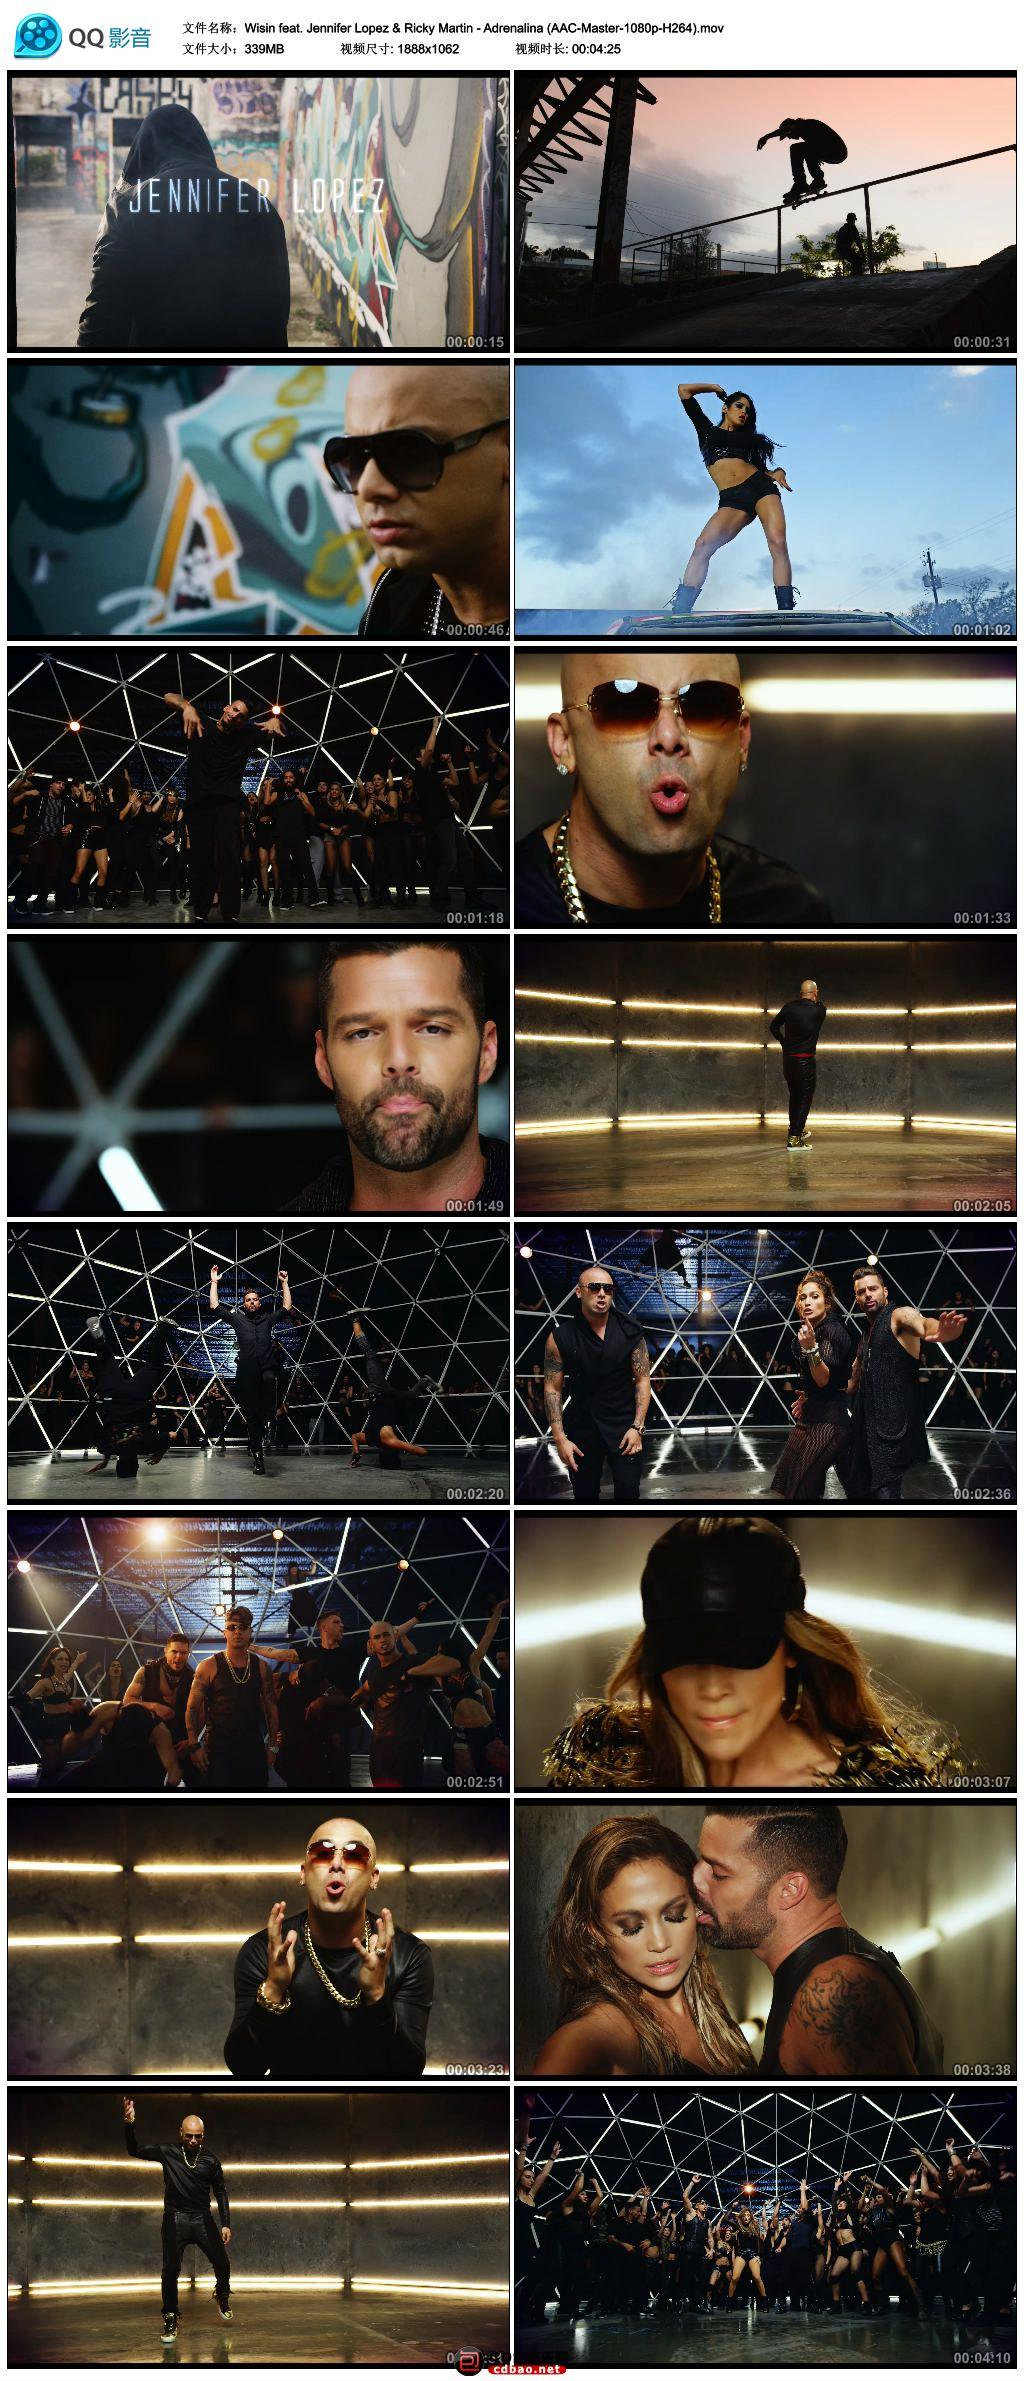 Wisin feat. Jennifer Lopez & Ricky Martin - Adrenalina (AAC-Master-1080p-H264).m.jpg